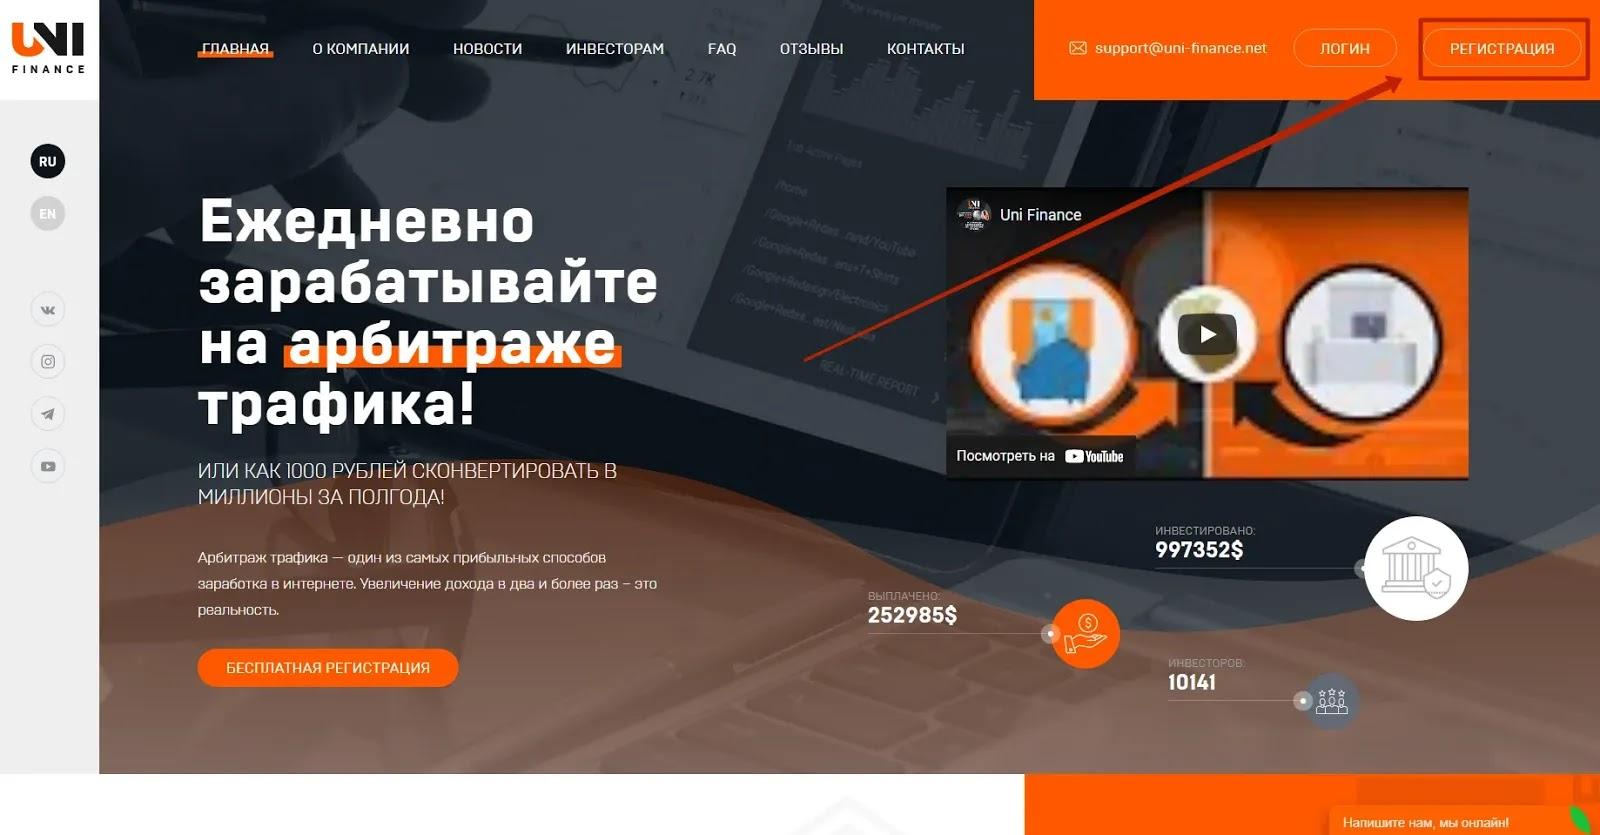 Регистрация в Uni Finance